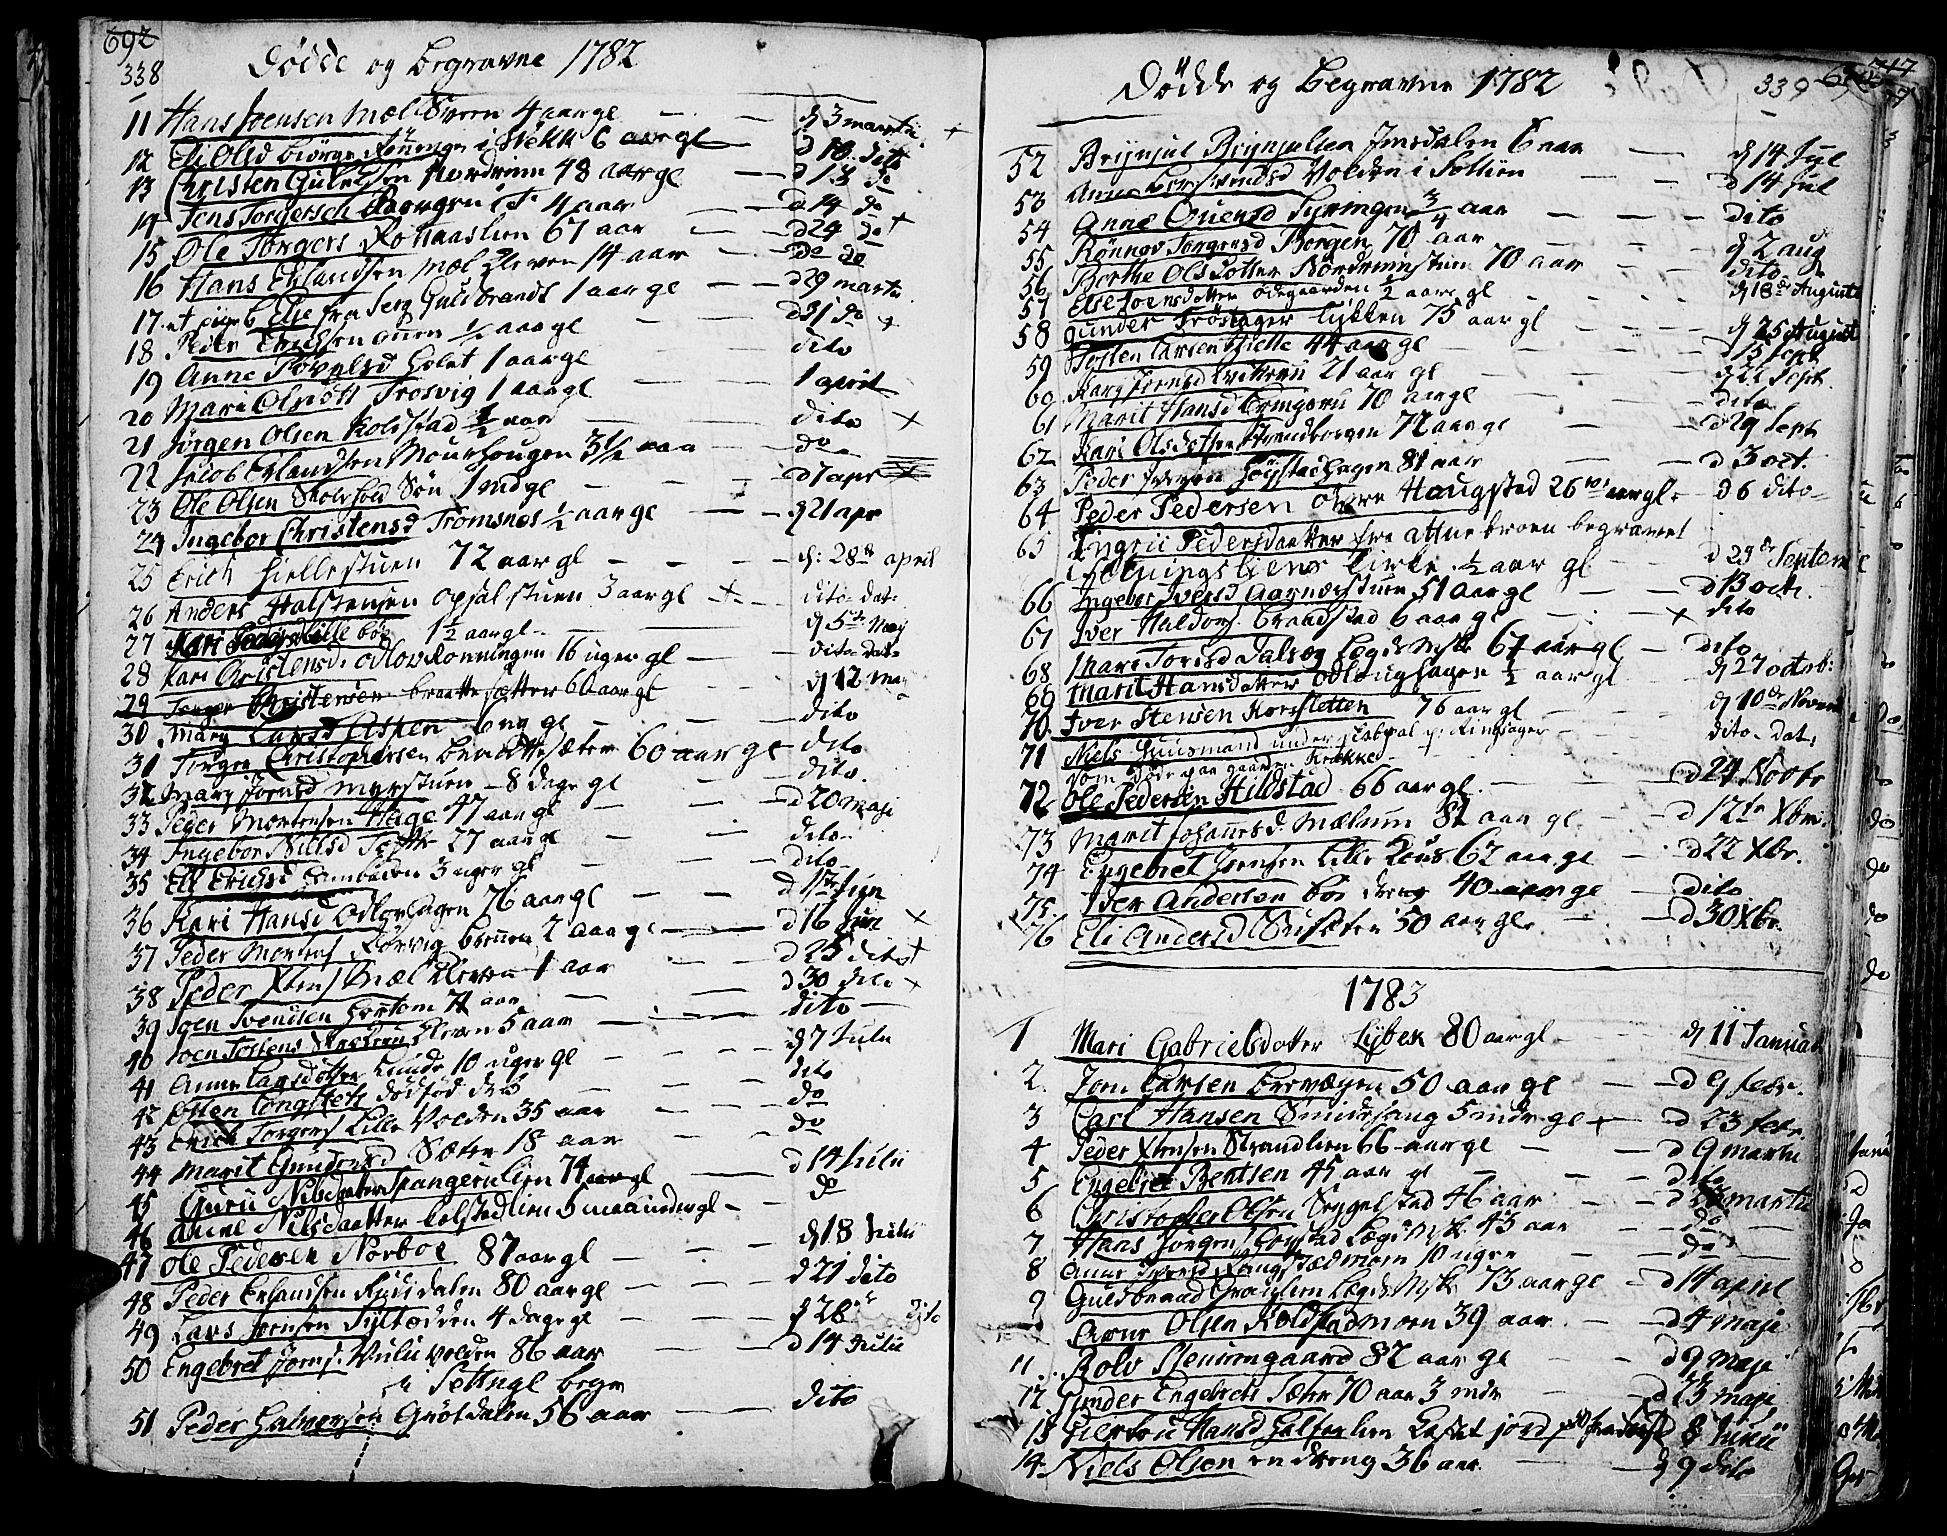 SAH, Ringebu prestekontor, Ministerialbok nr. 3, 1781-1820, s. 338-339